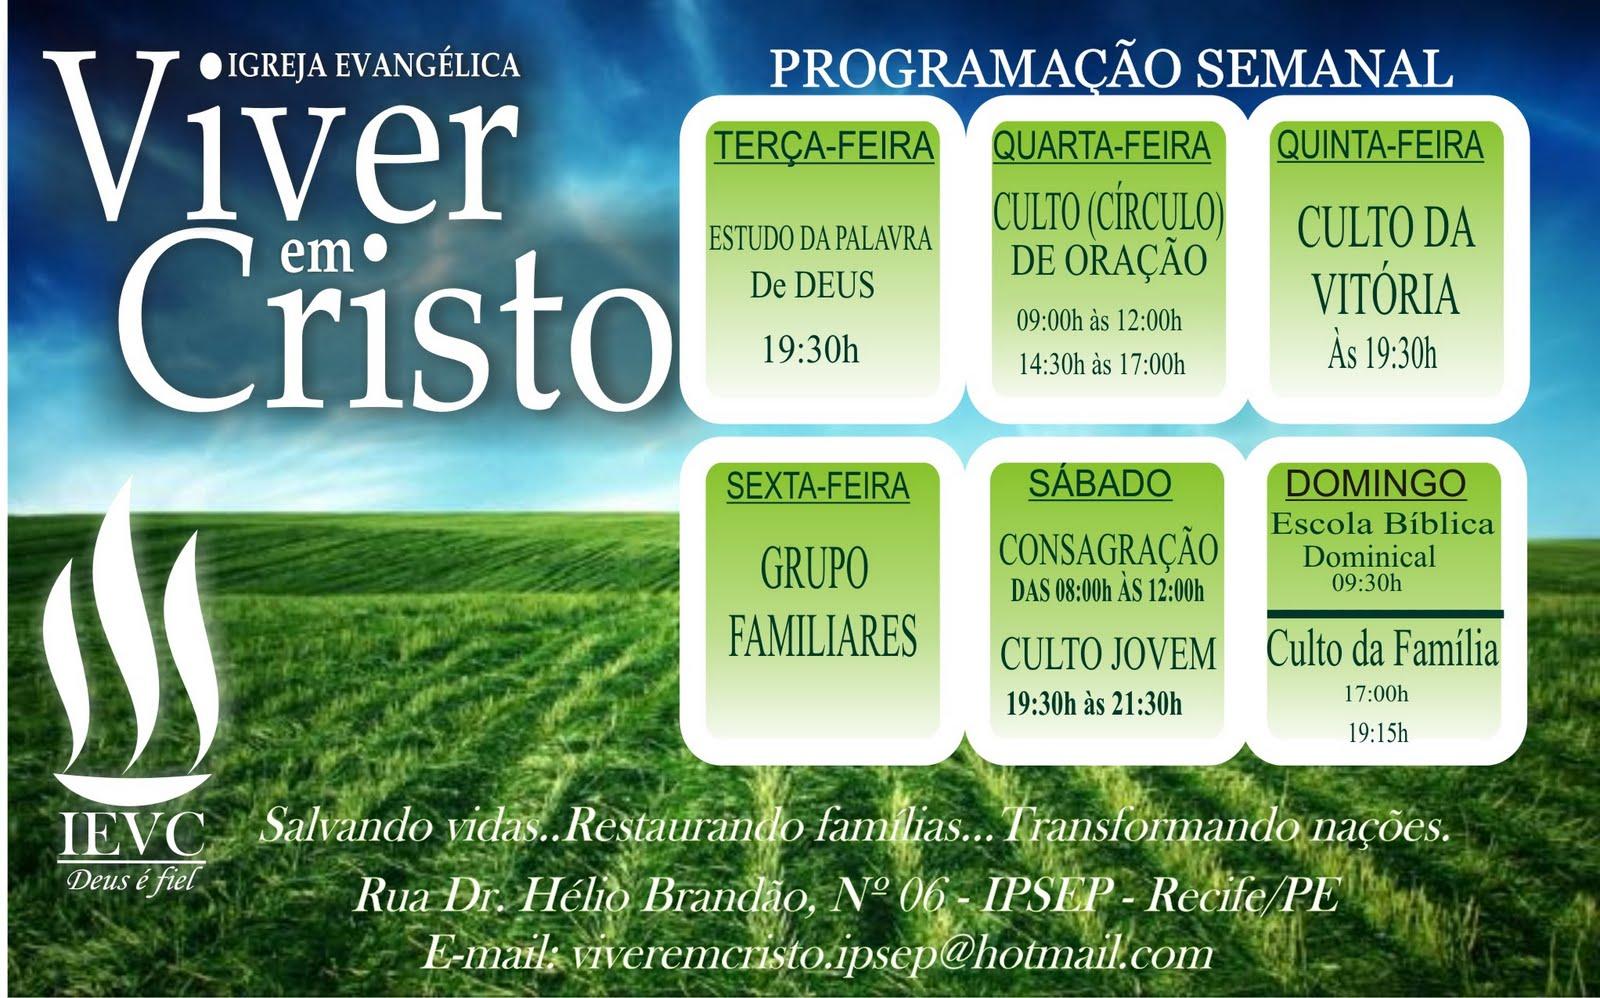 Igreja Evangélica Viver em Cristo - Ipsep